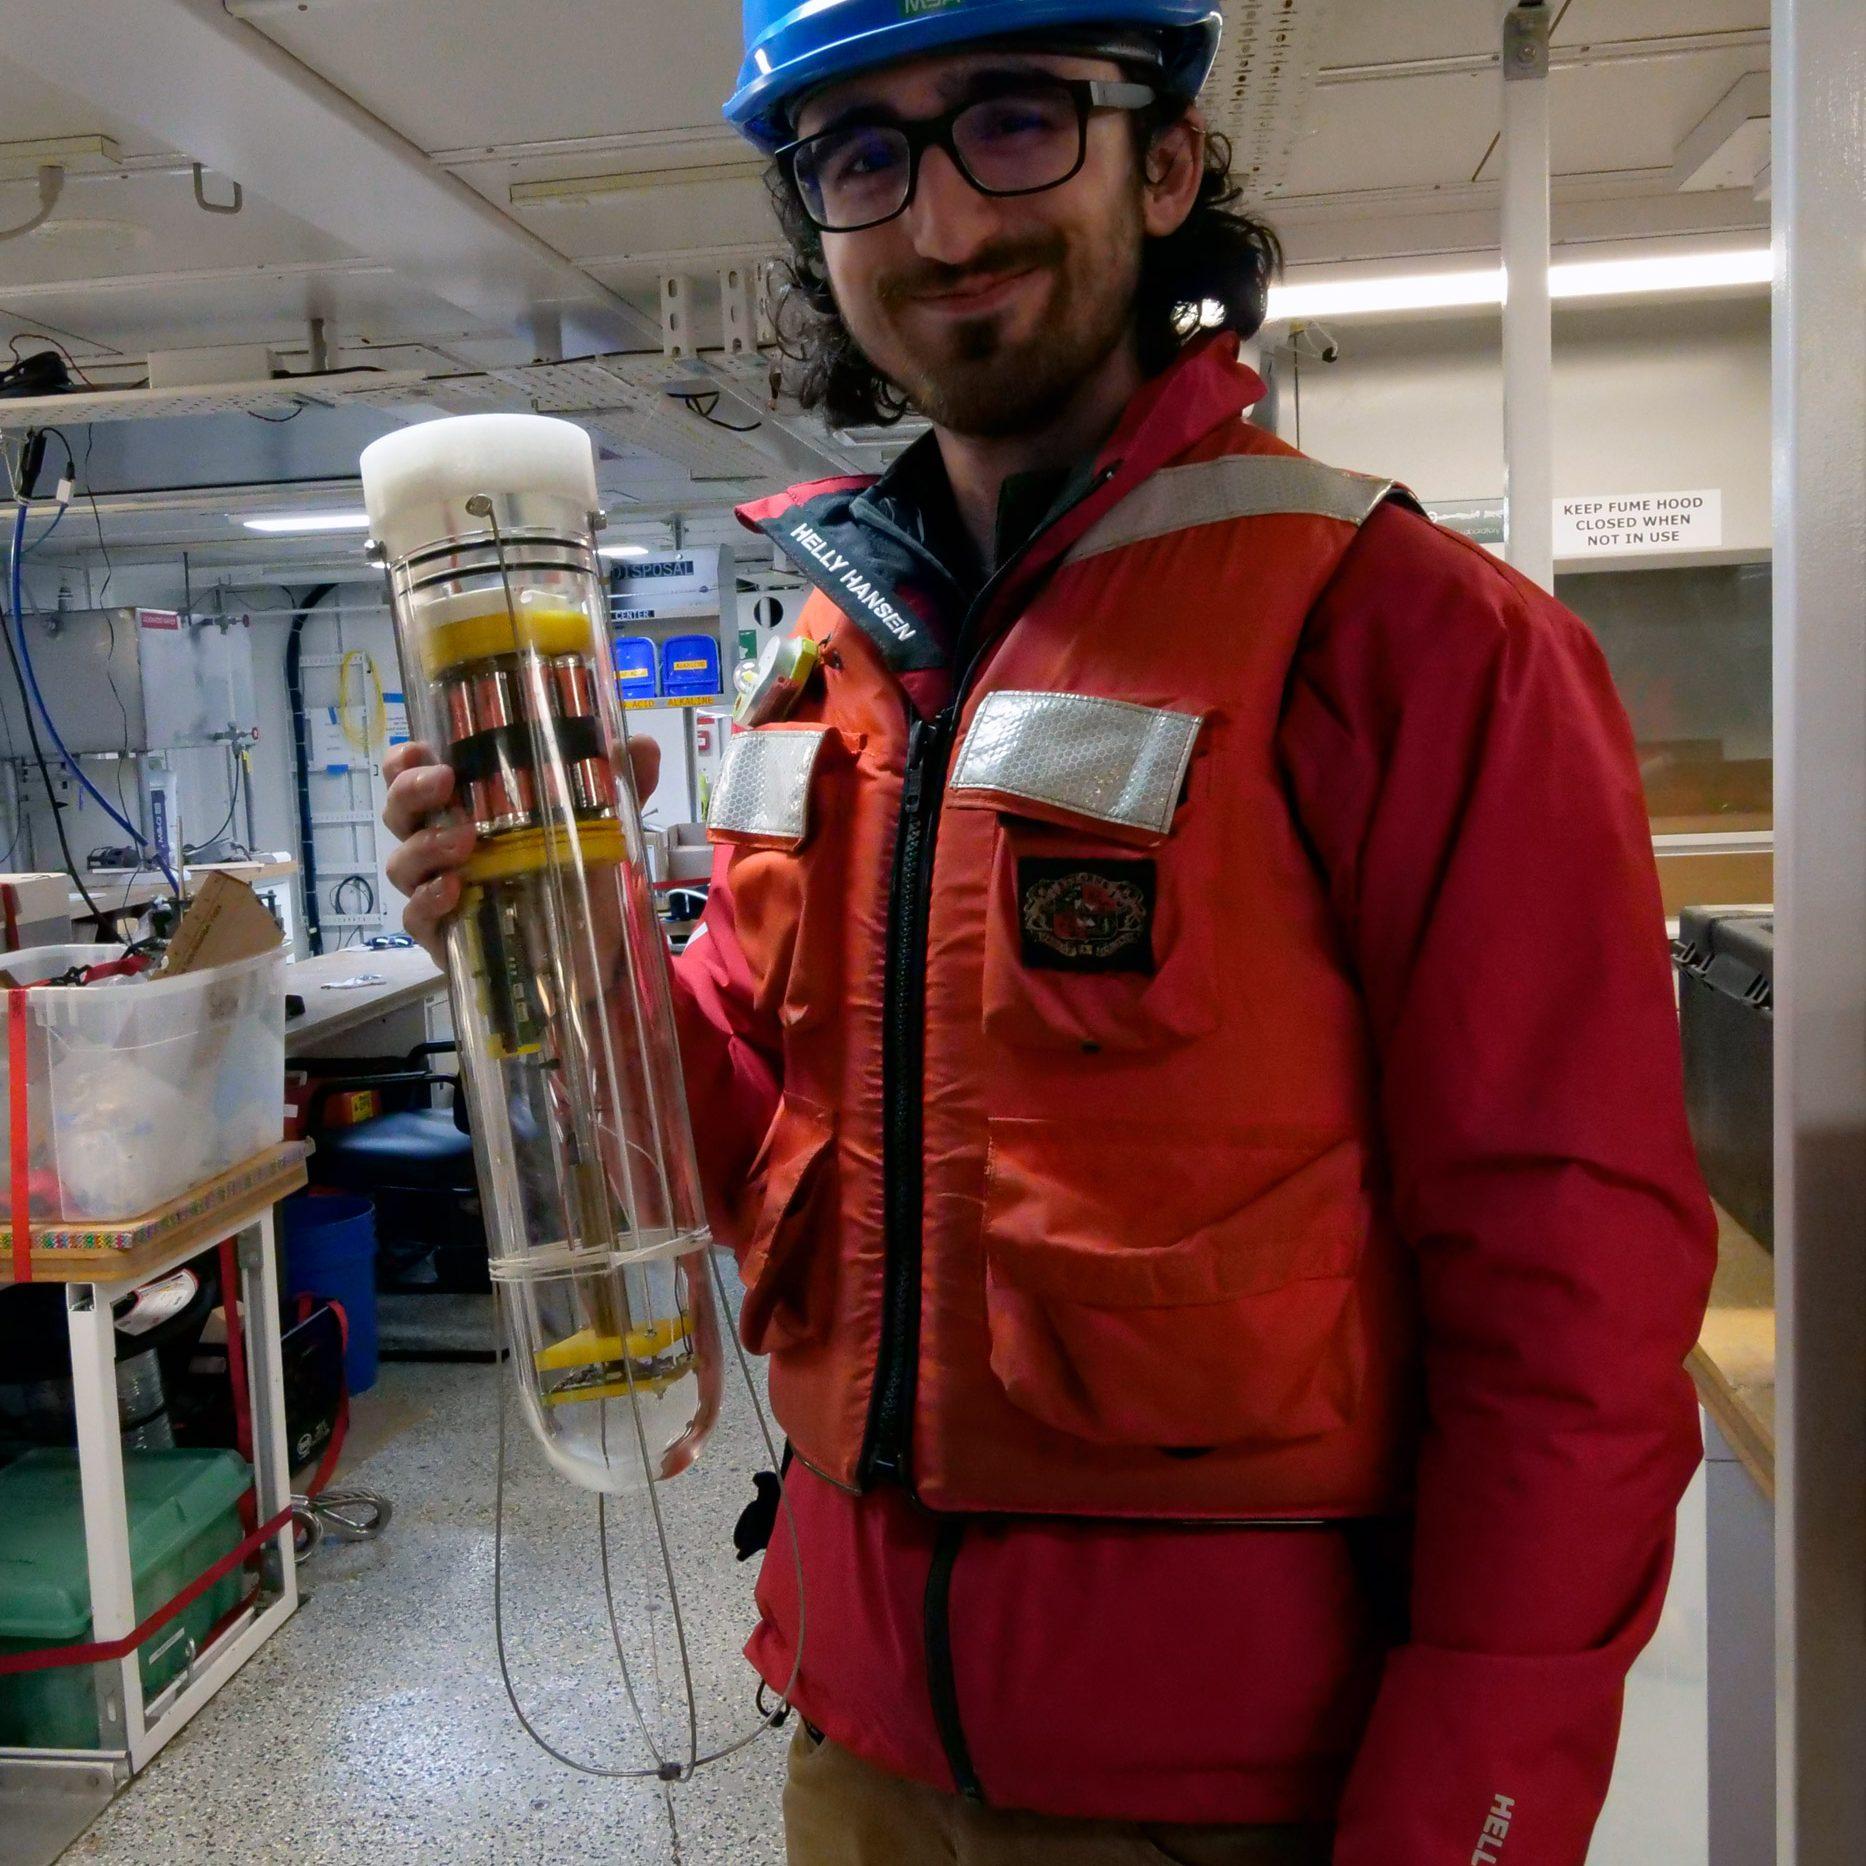 Jackson Sugar (URI) holding a prototype MINION unit. Photo by Ken Kostel, Woods Hole Oceanographic Institution.